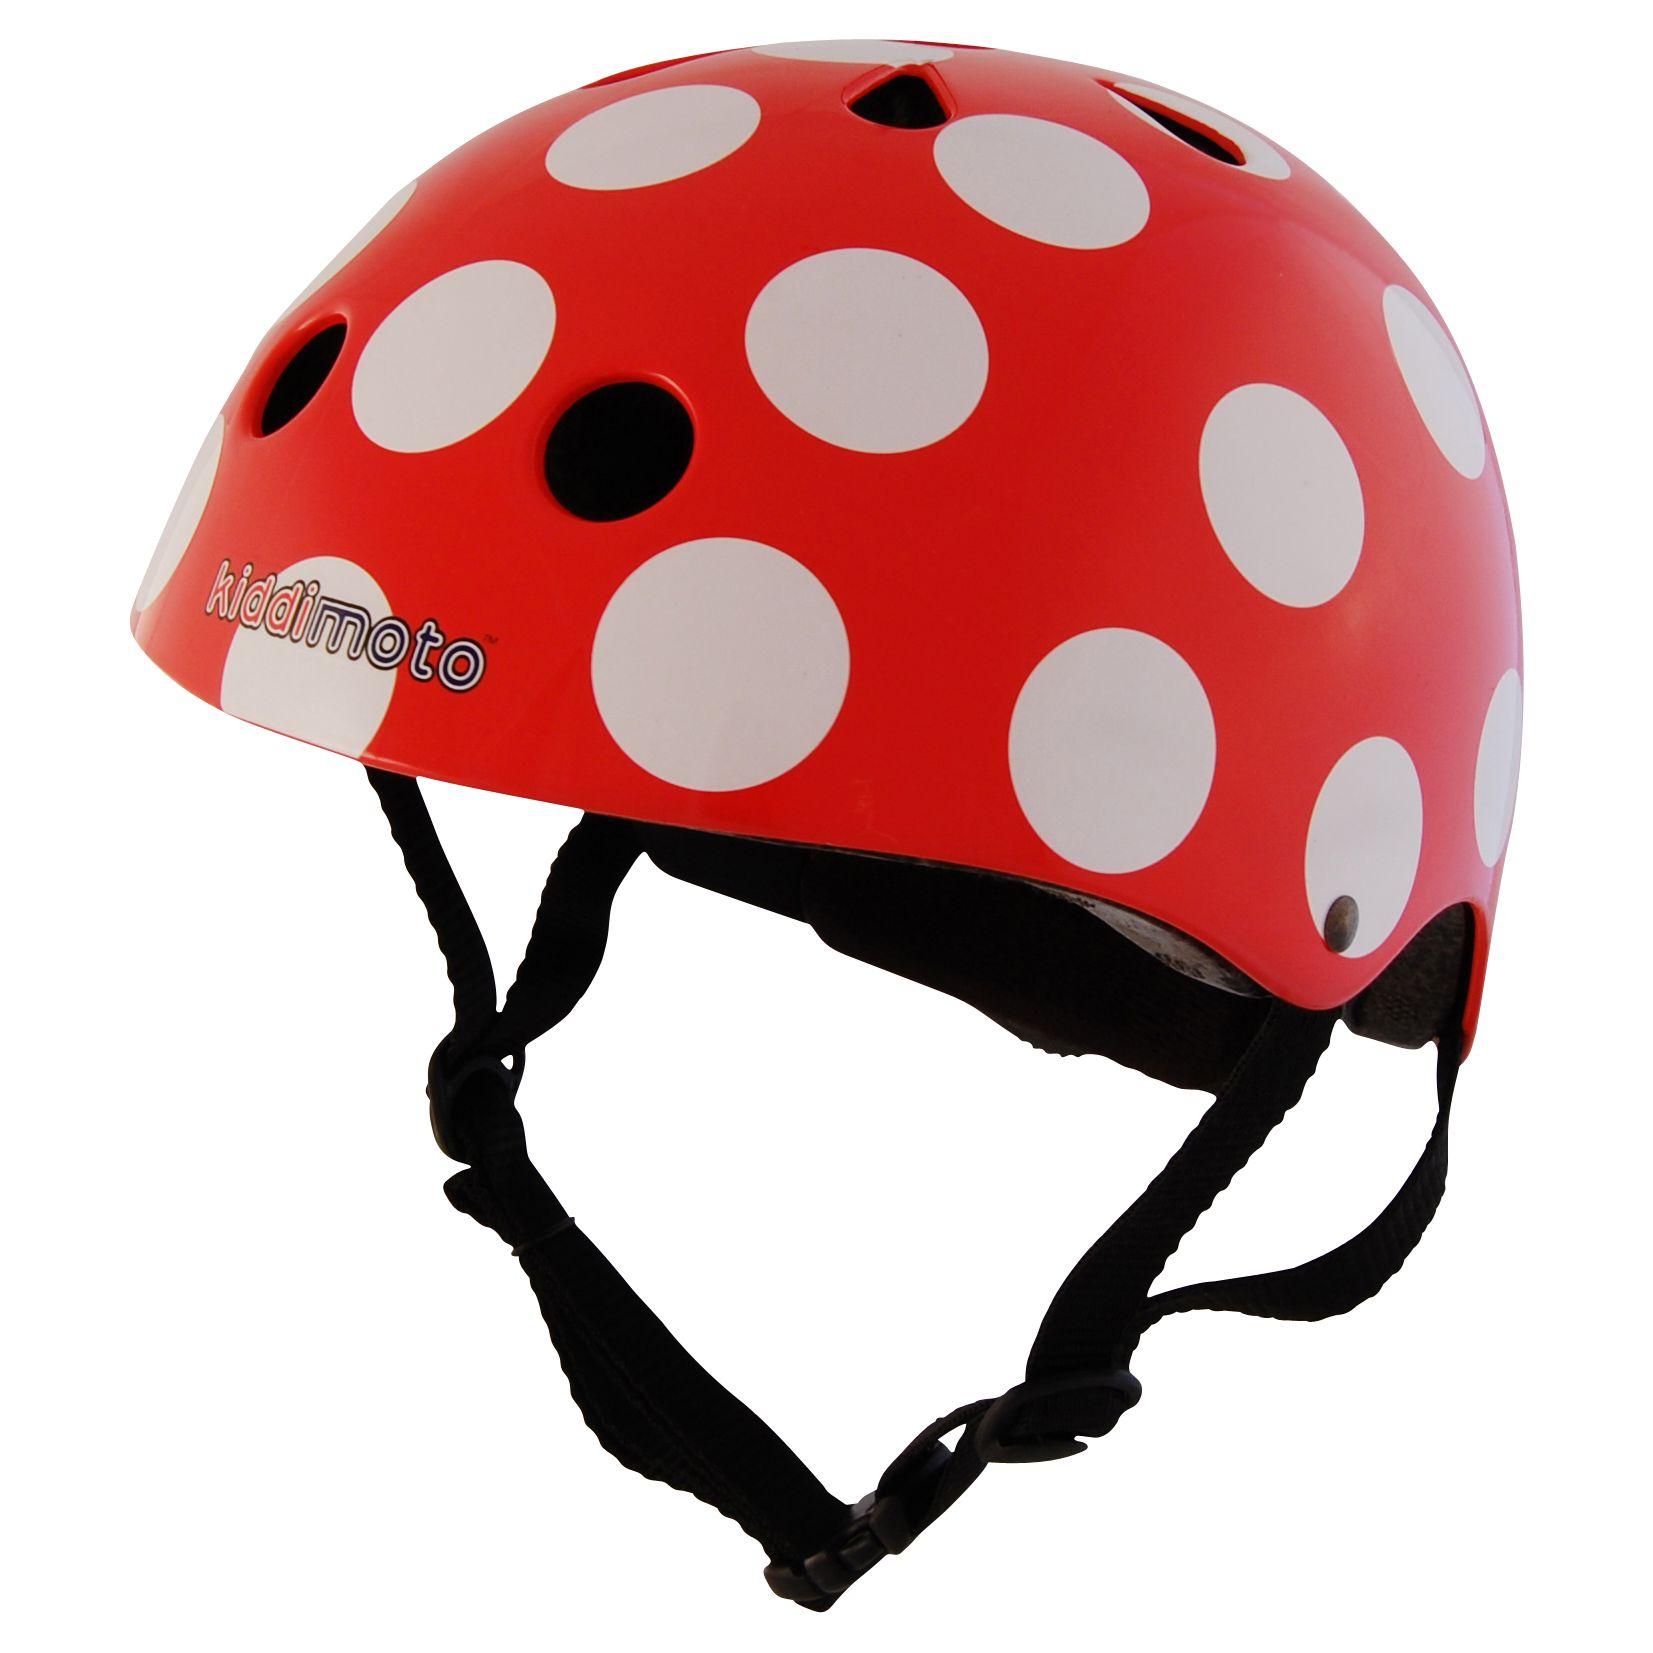 Kiddimoto Kiddimoto Red Dotty Helmet, Small